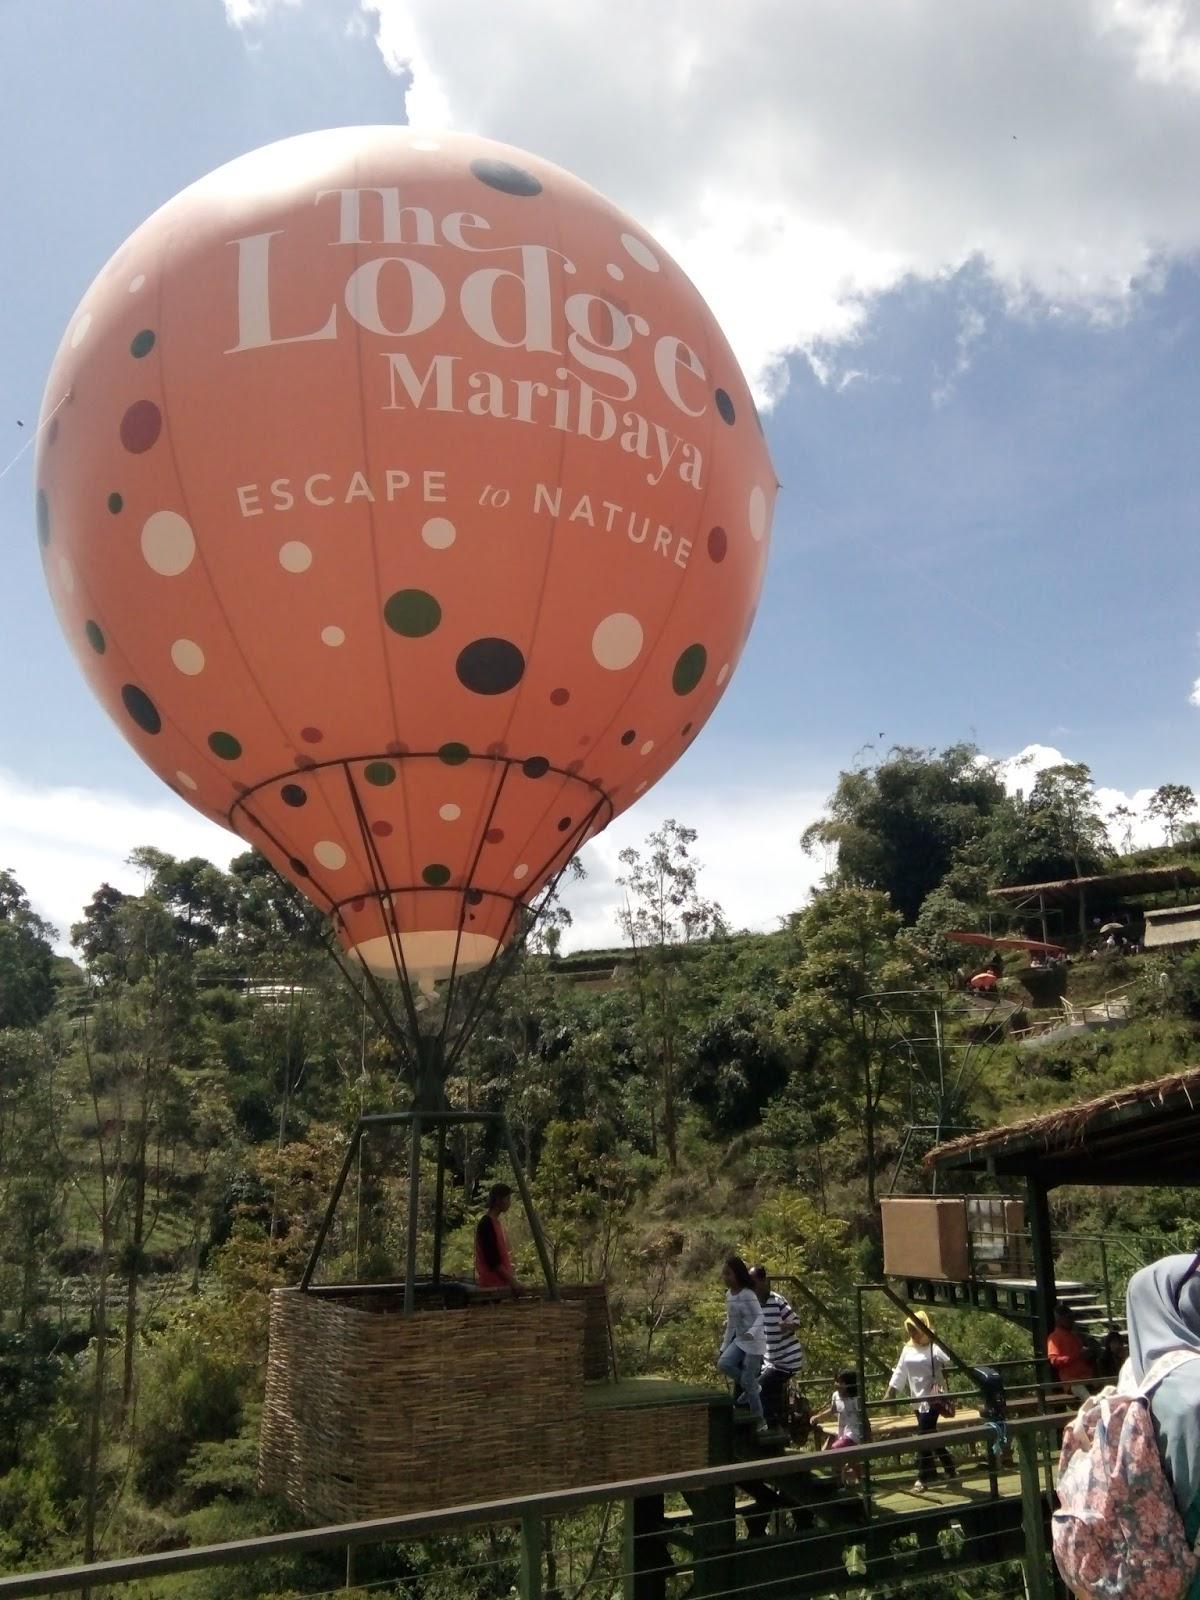 Lodge Maribaya Bandung Wisata Alam Jaman Cayo Indonesia Balon Udara